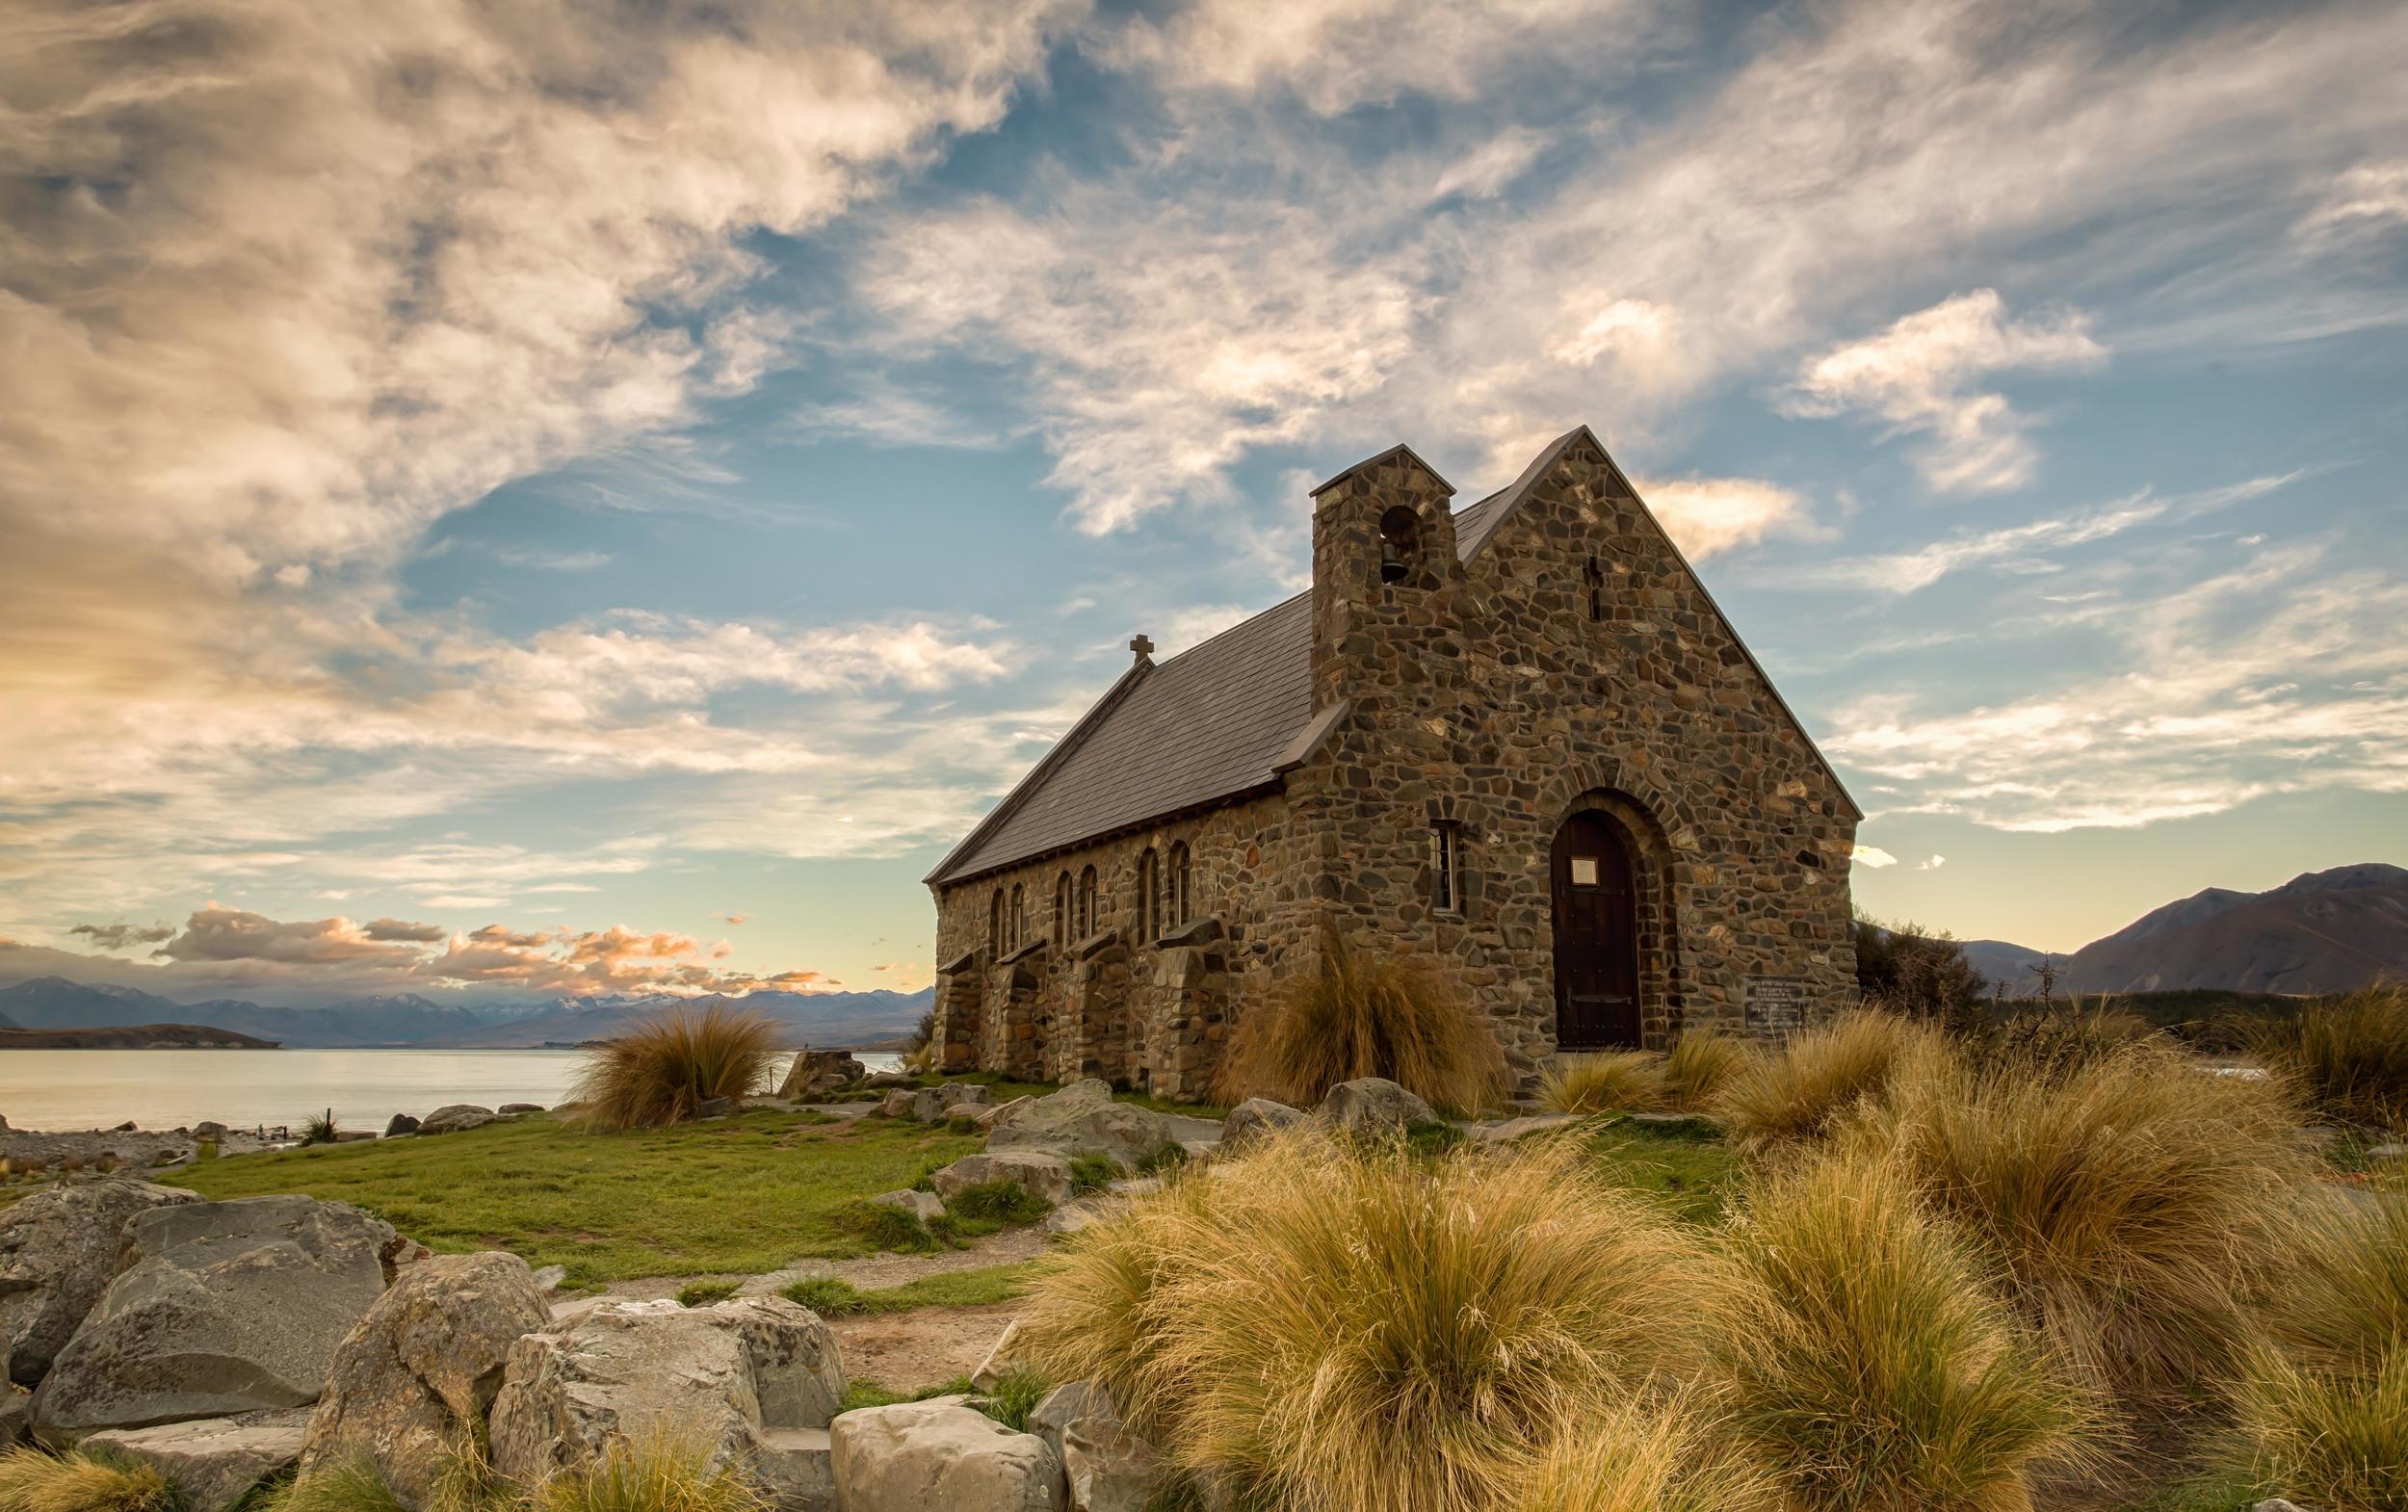 Church of the Good Shepherd - 25/04/2015